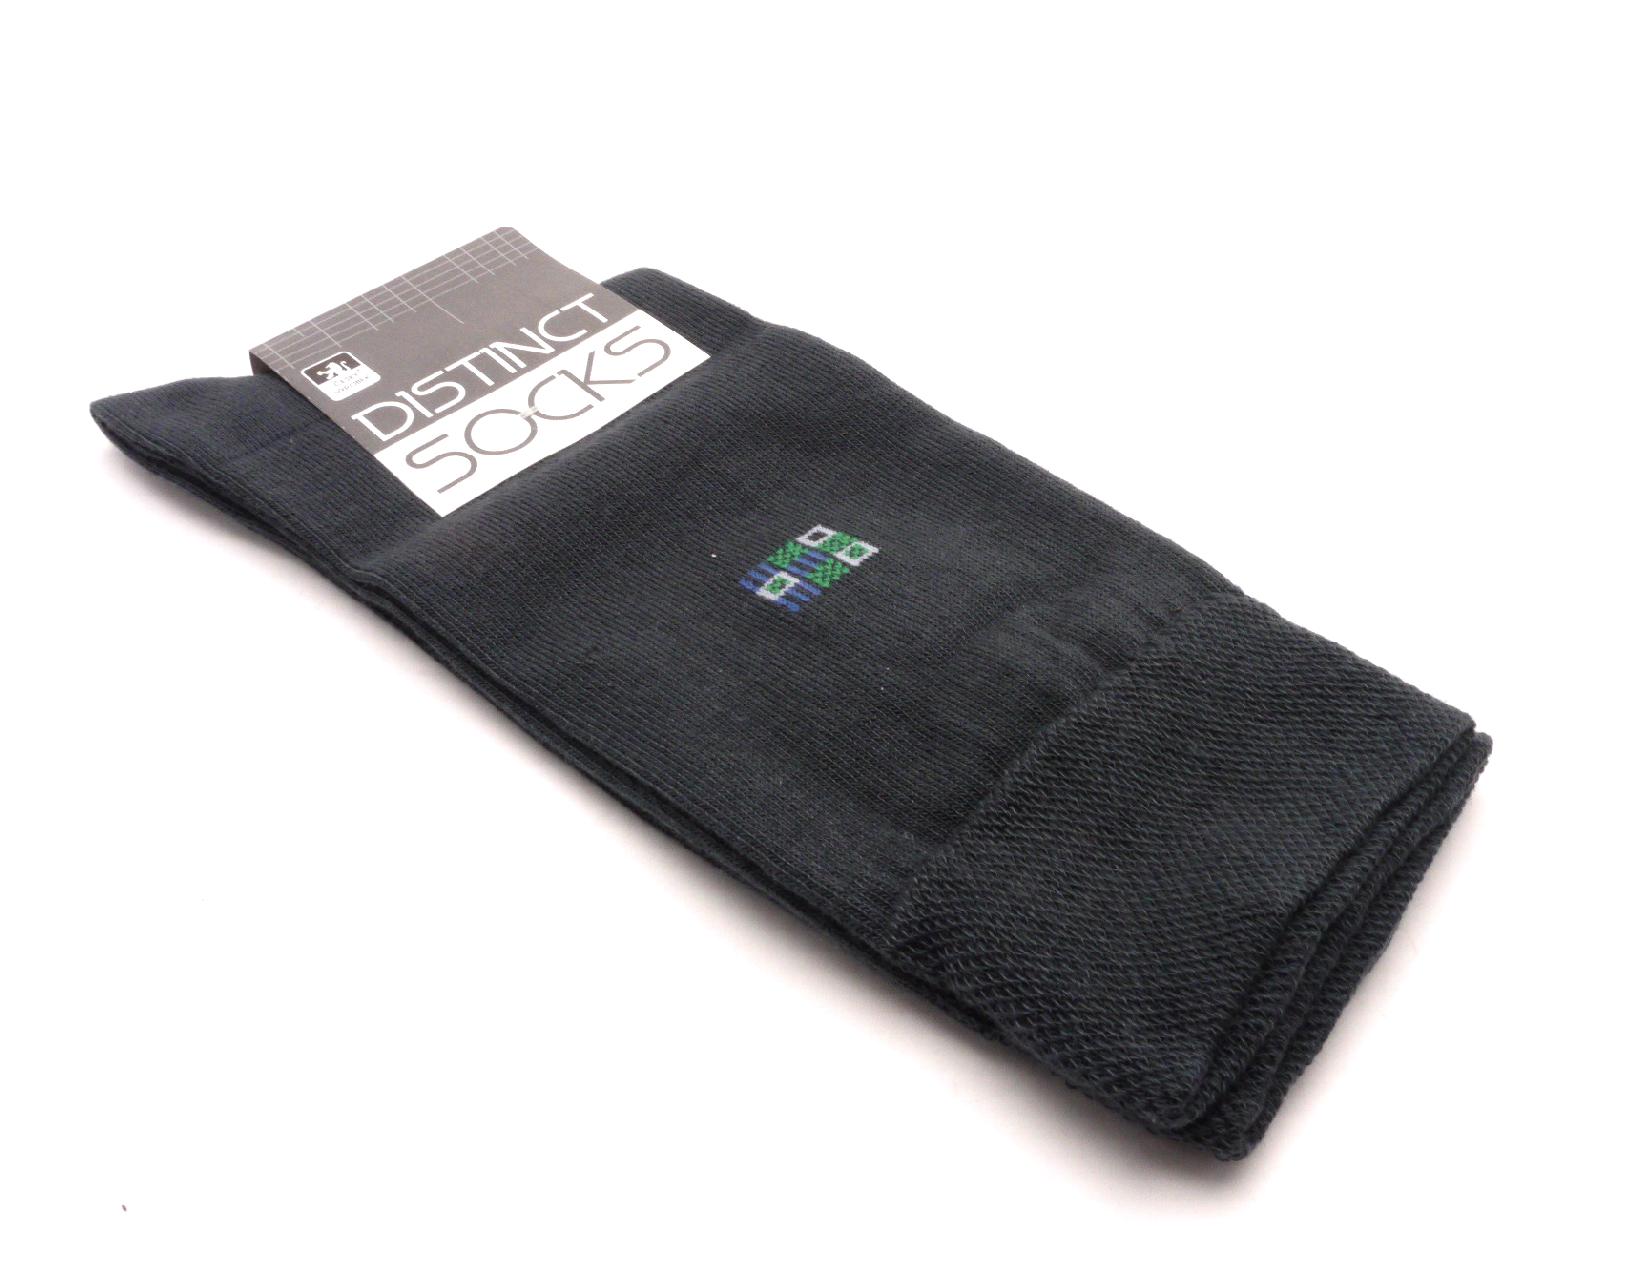 Tapo Ponožky distinct šedá- čtverec modrý velikost: 41-43